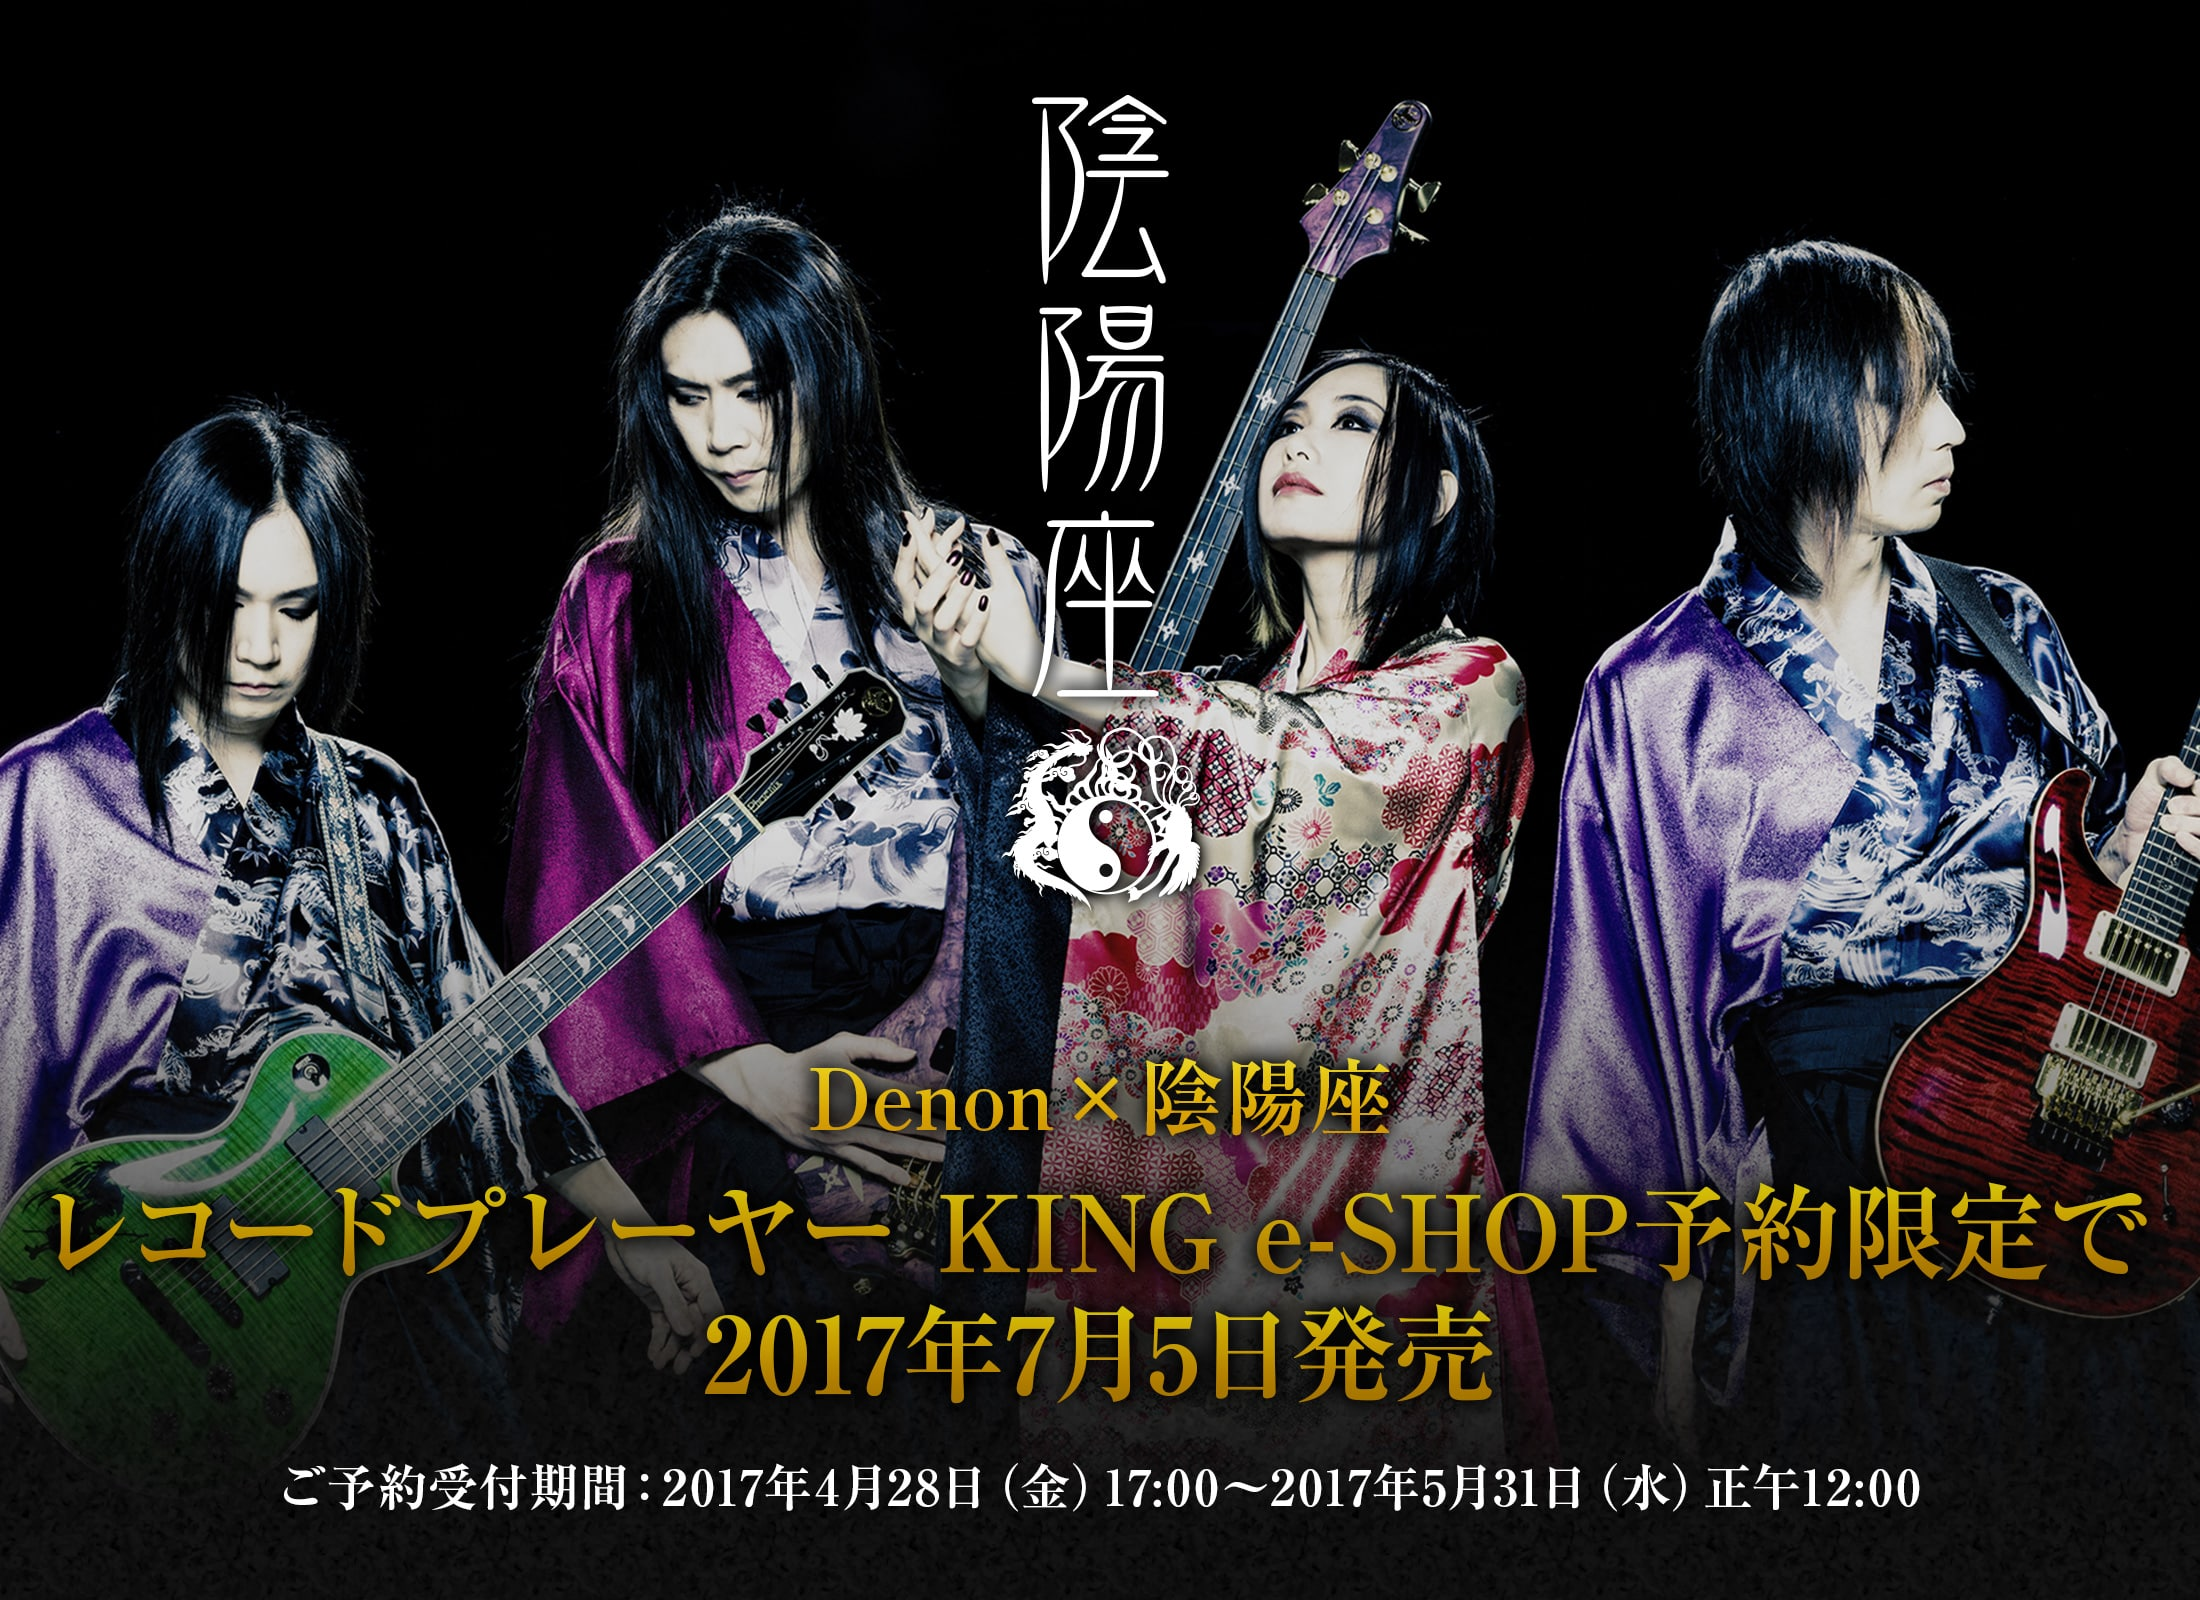 Denon×陰陽座 レコードプレーヤー KING e-SHOP予約限定で2017年7月5日発売。ご予約受付期間:2017年4月28日(金)17:00〜2017年5月31日(水)正午12:00